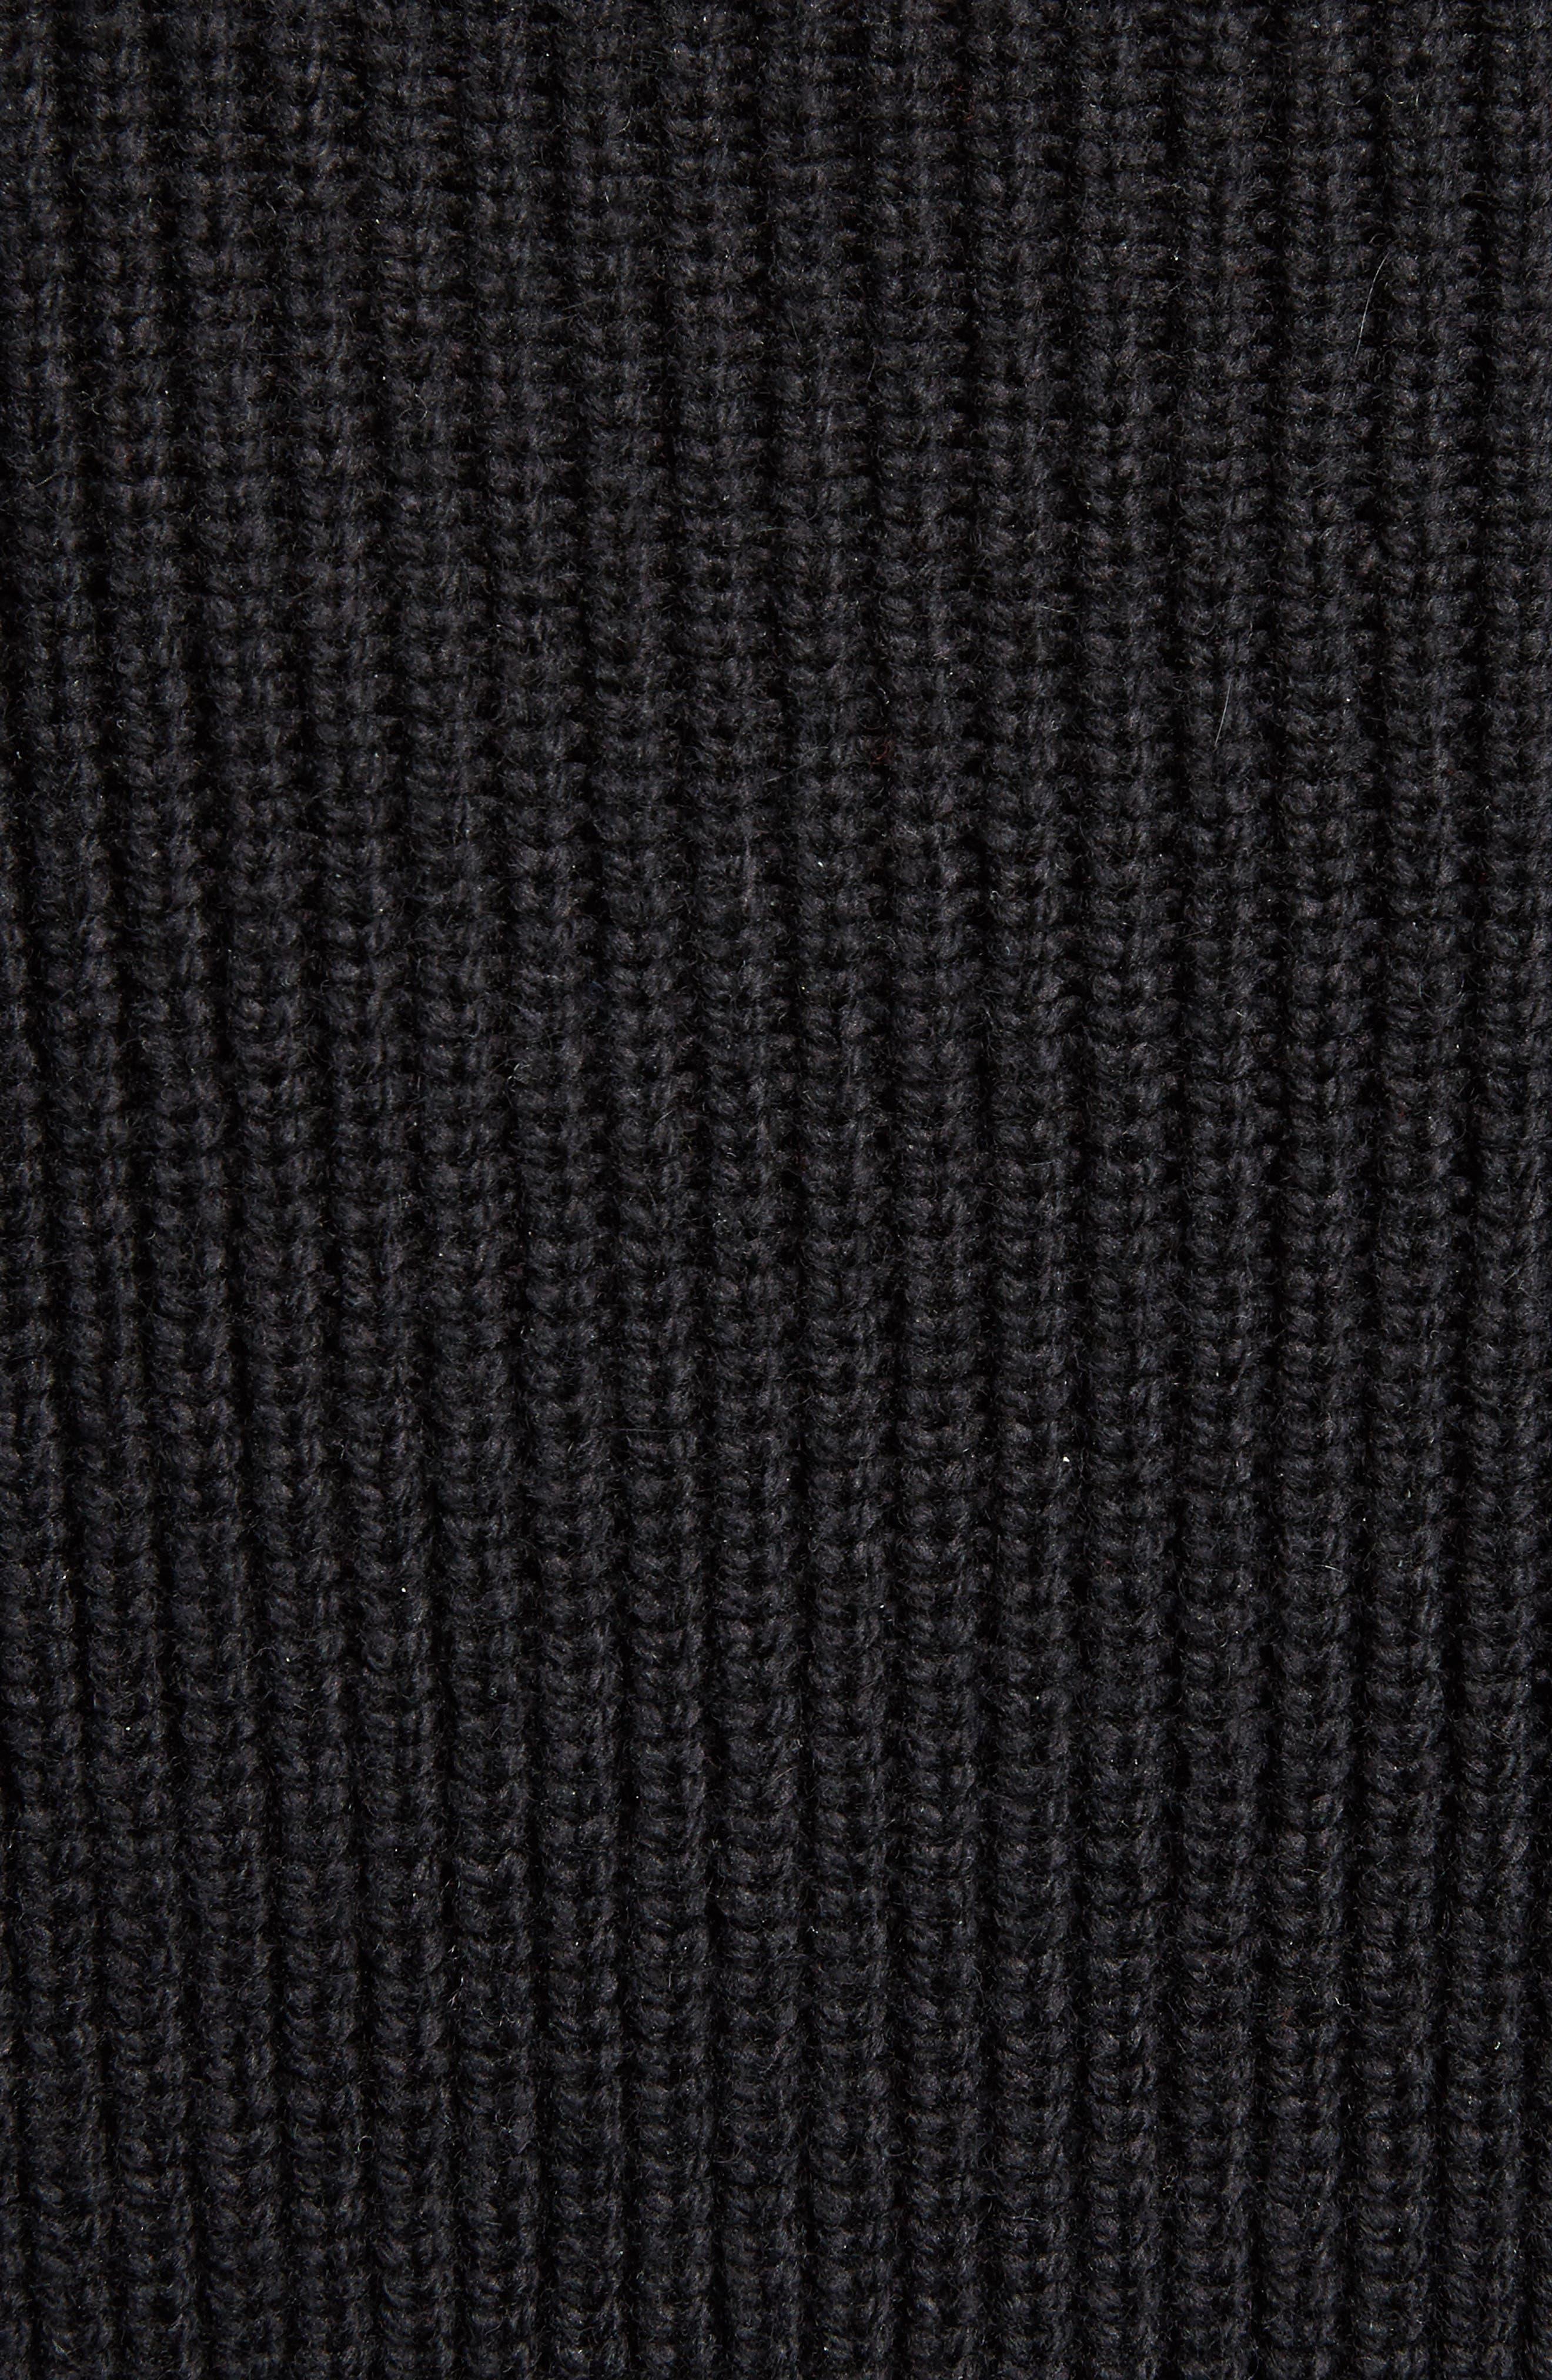 Wool & Cashmere Blend Knit Tunic,                             Alternate thumbnail 5, color,                             001